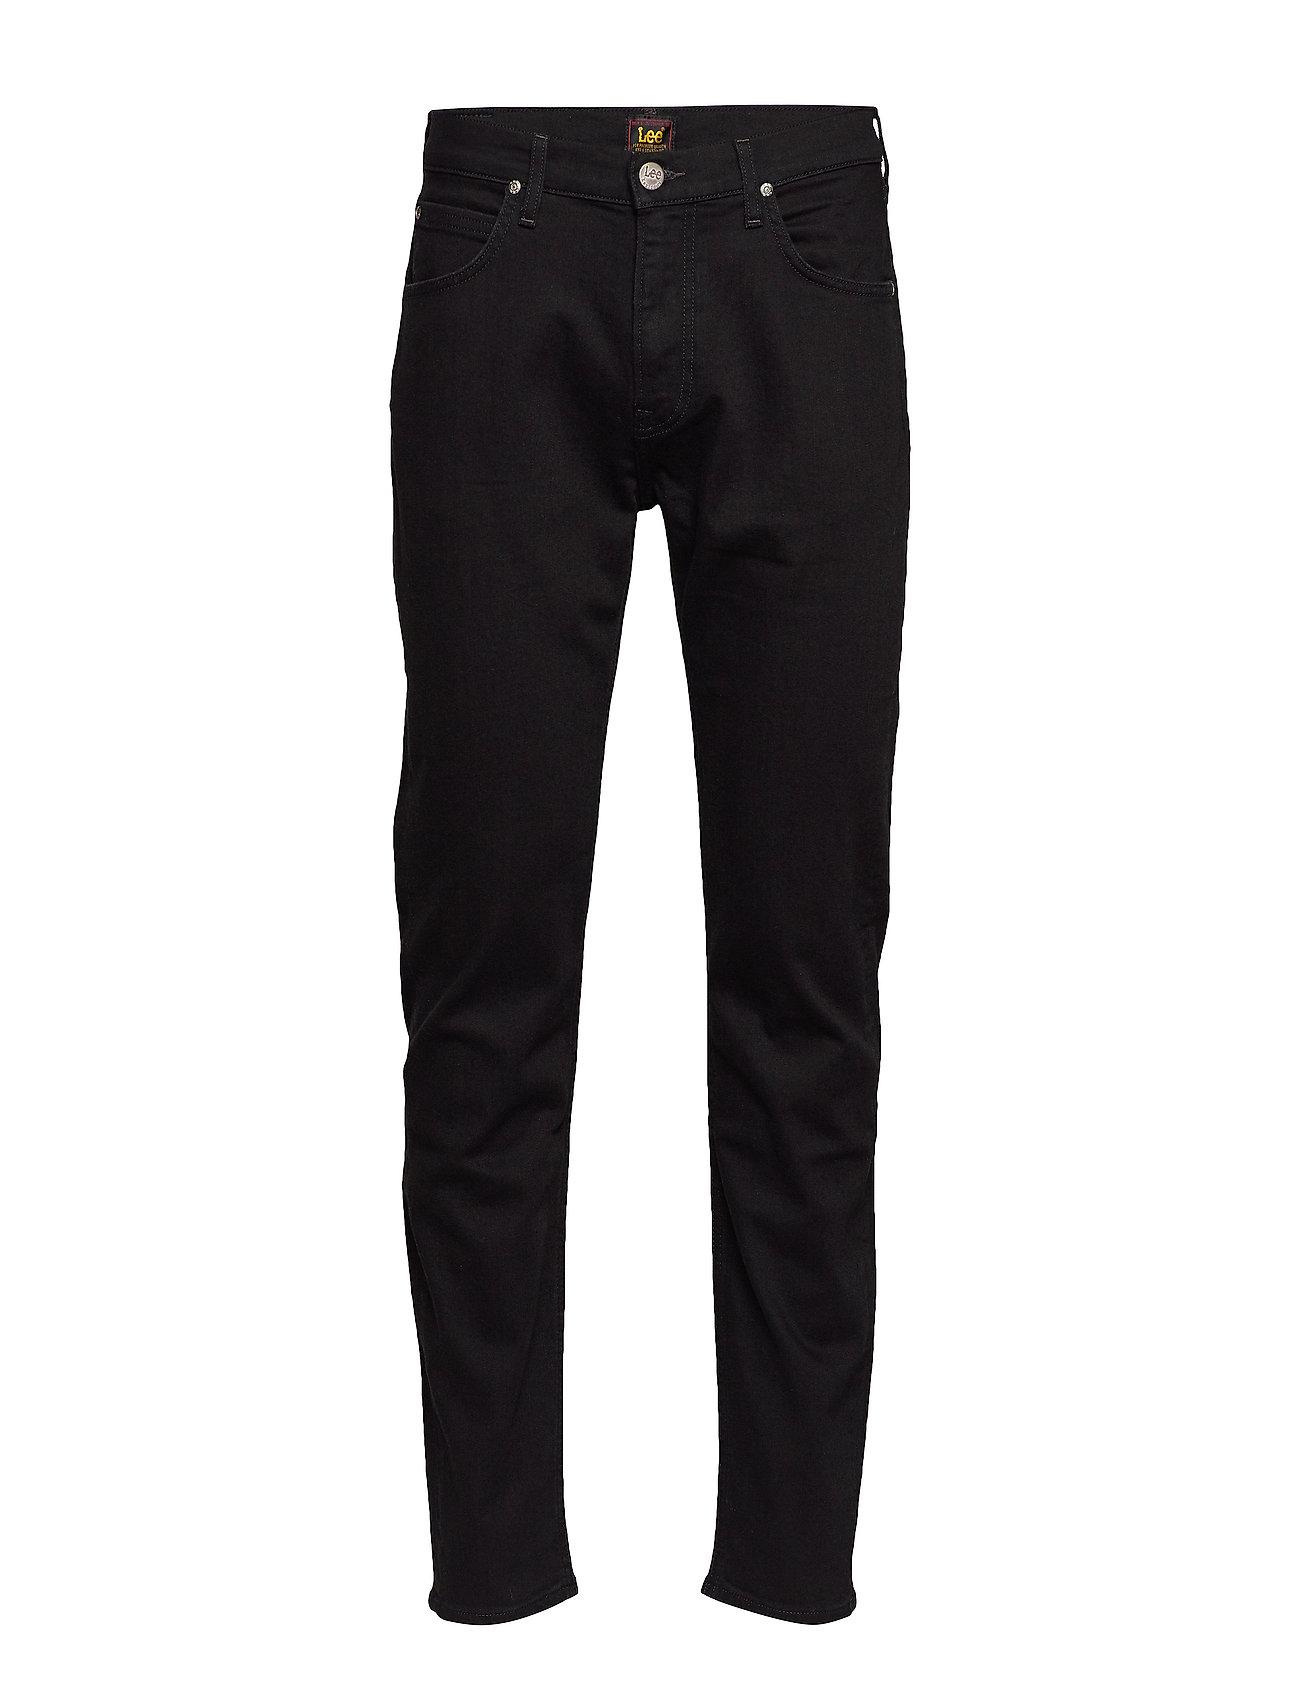 Lee Jeans - AUSTIN - regular jeans - clean black - 0